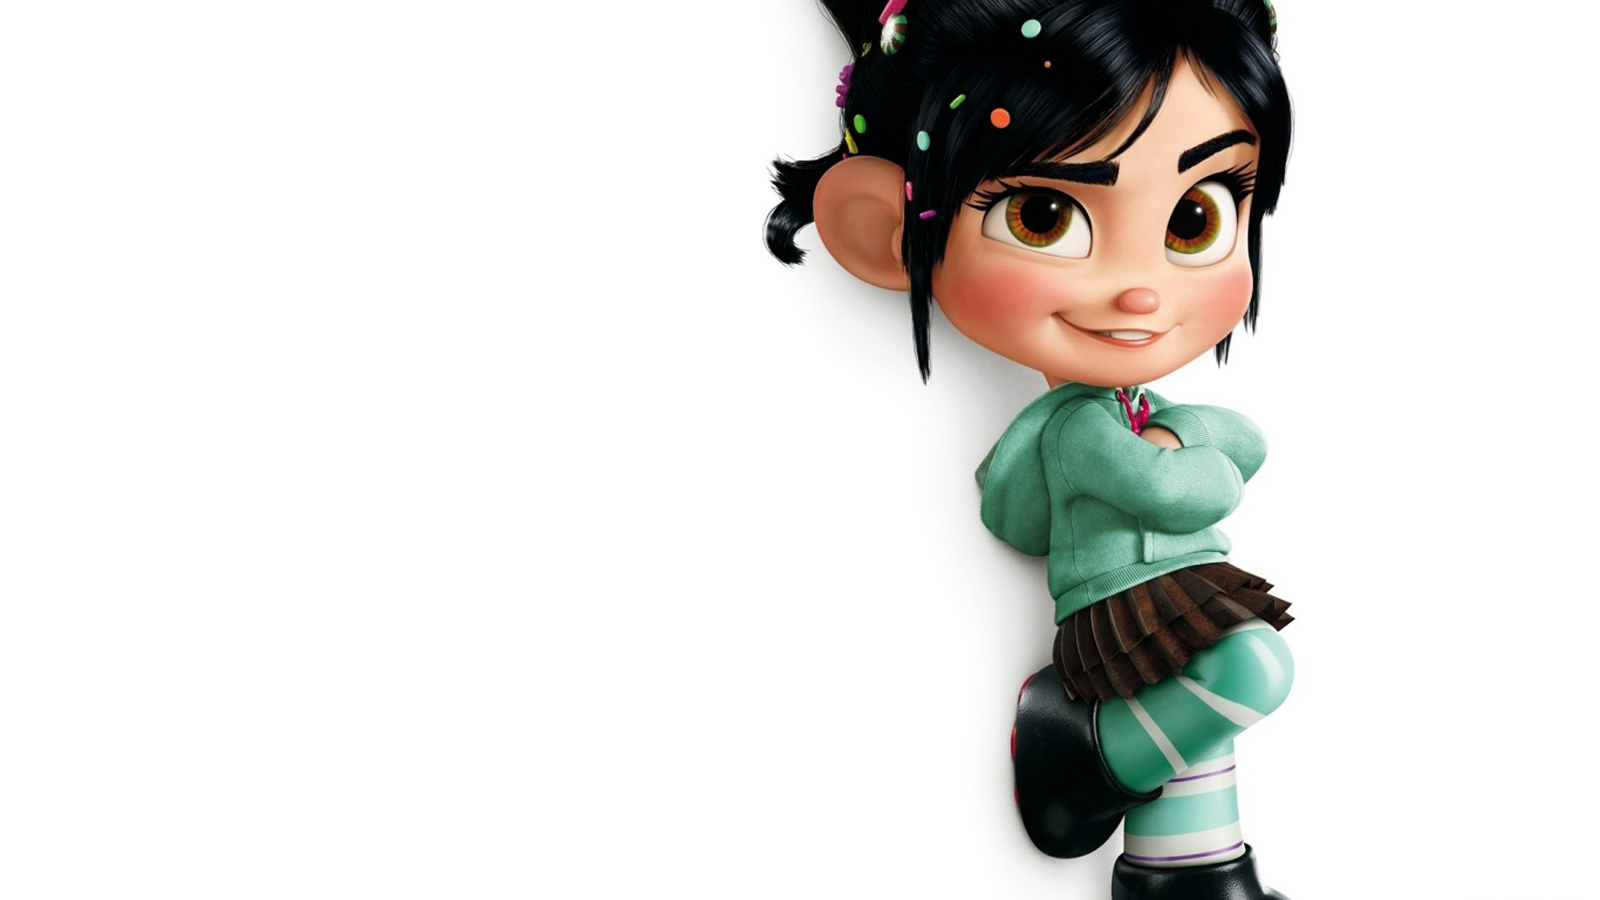 Disney Wreck It Ralph 3D Animation HD WallpapersImage to Wallpaper 1600x900